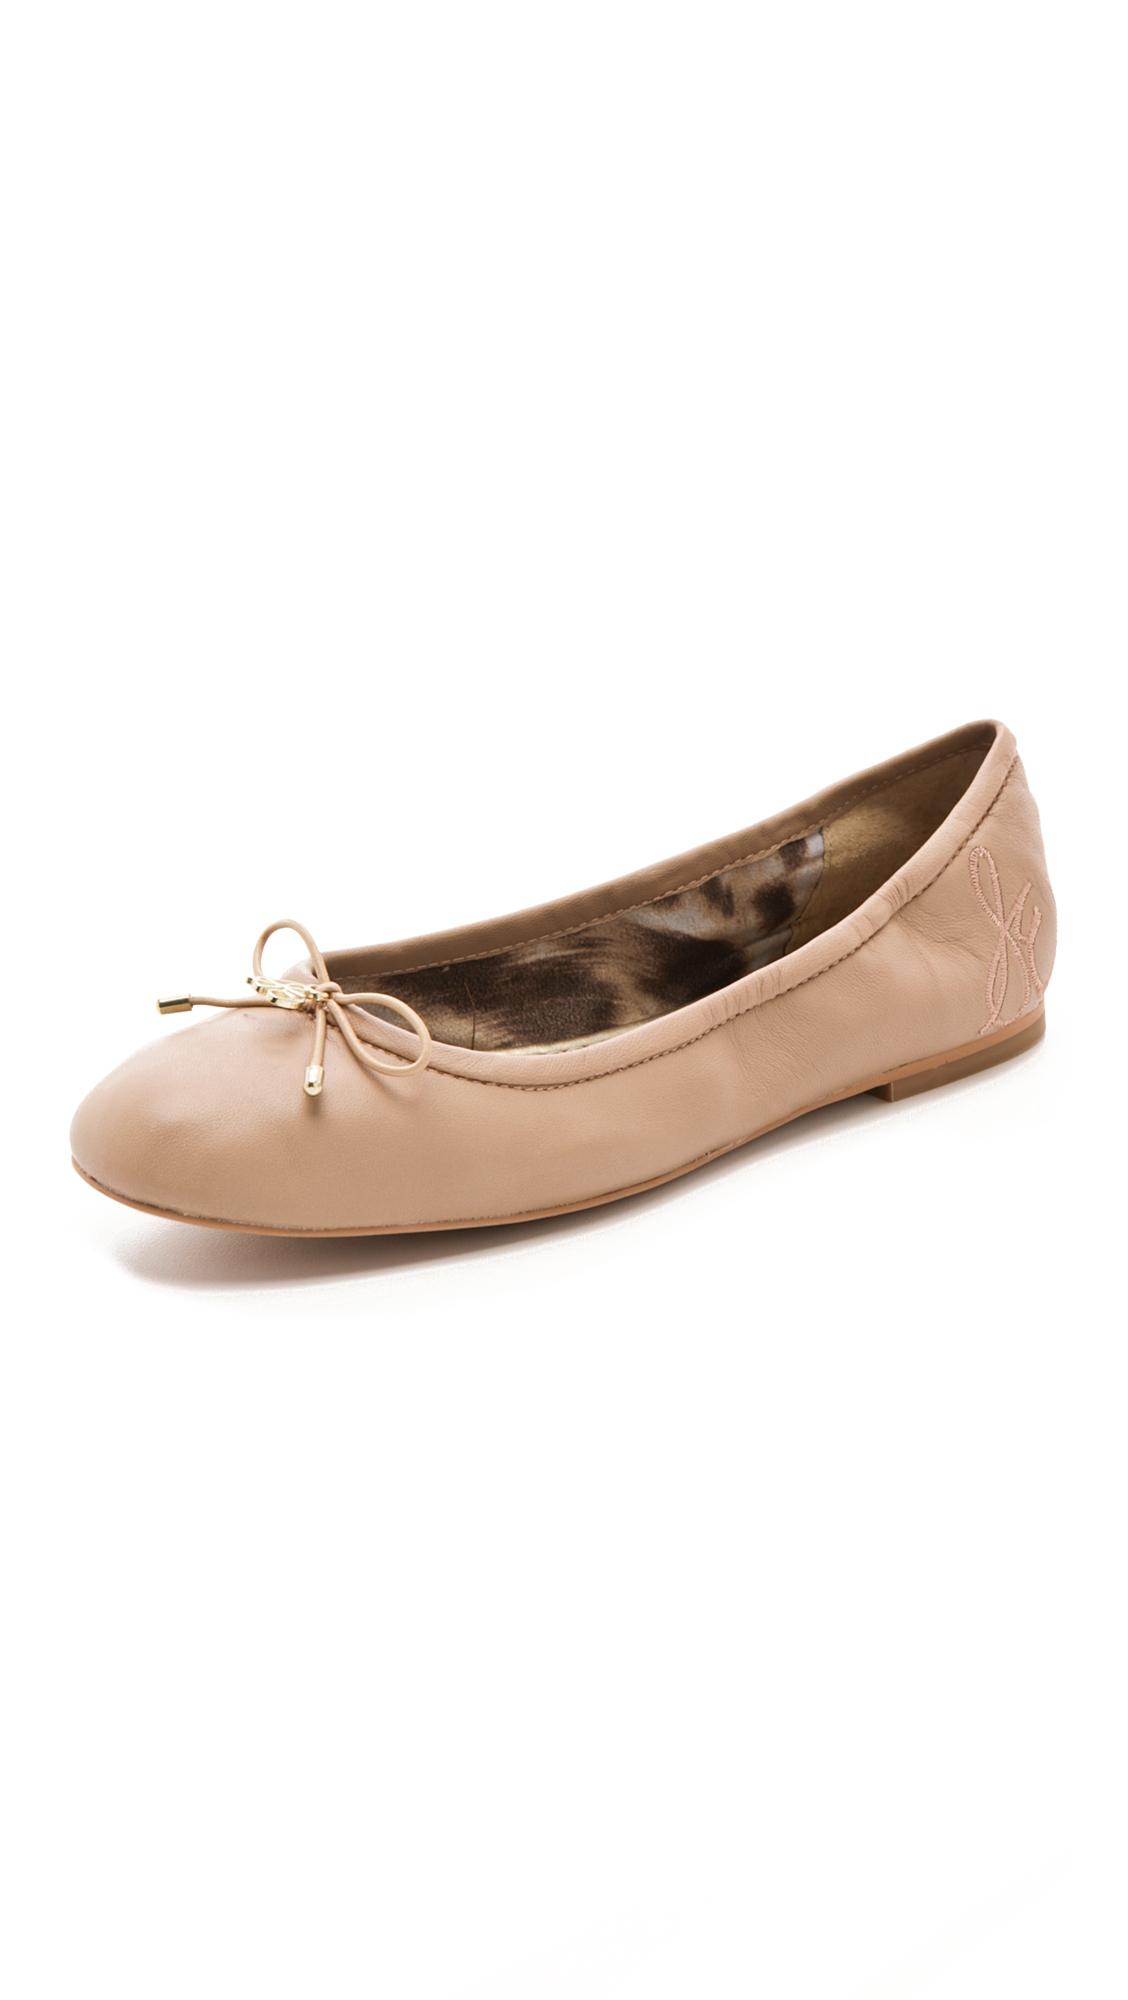 Sam Edelman Suede Ballerinas Gr. US 7 u14J0P